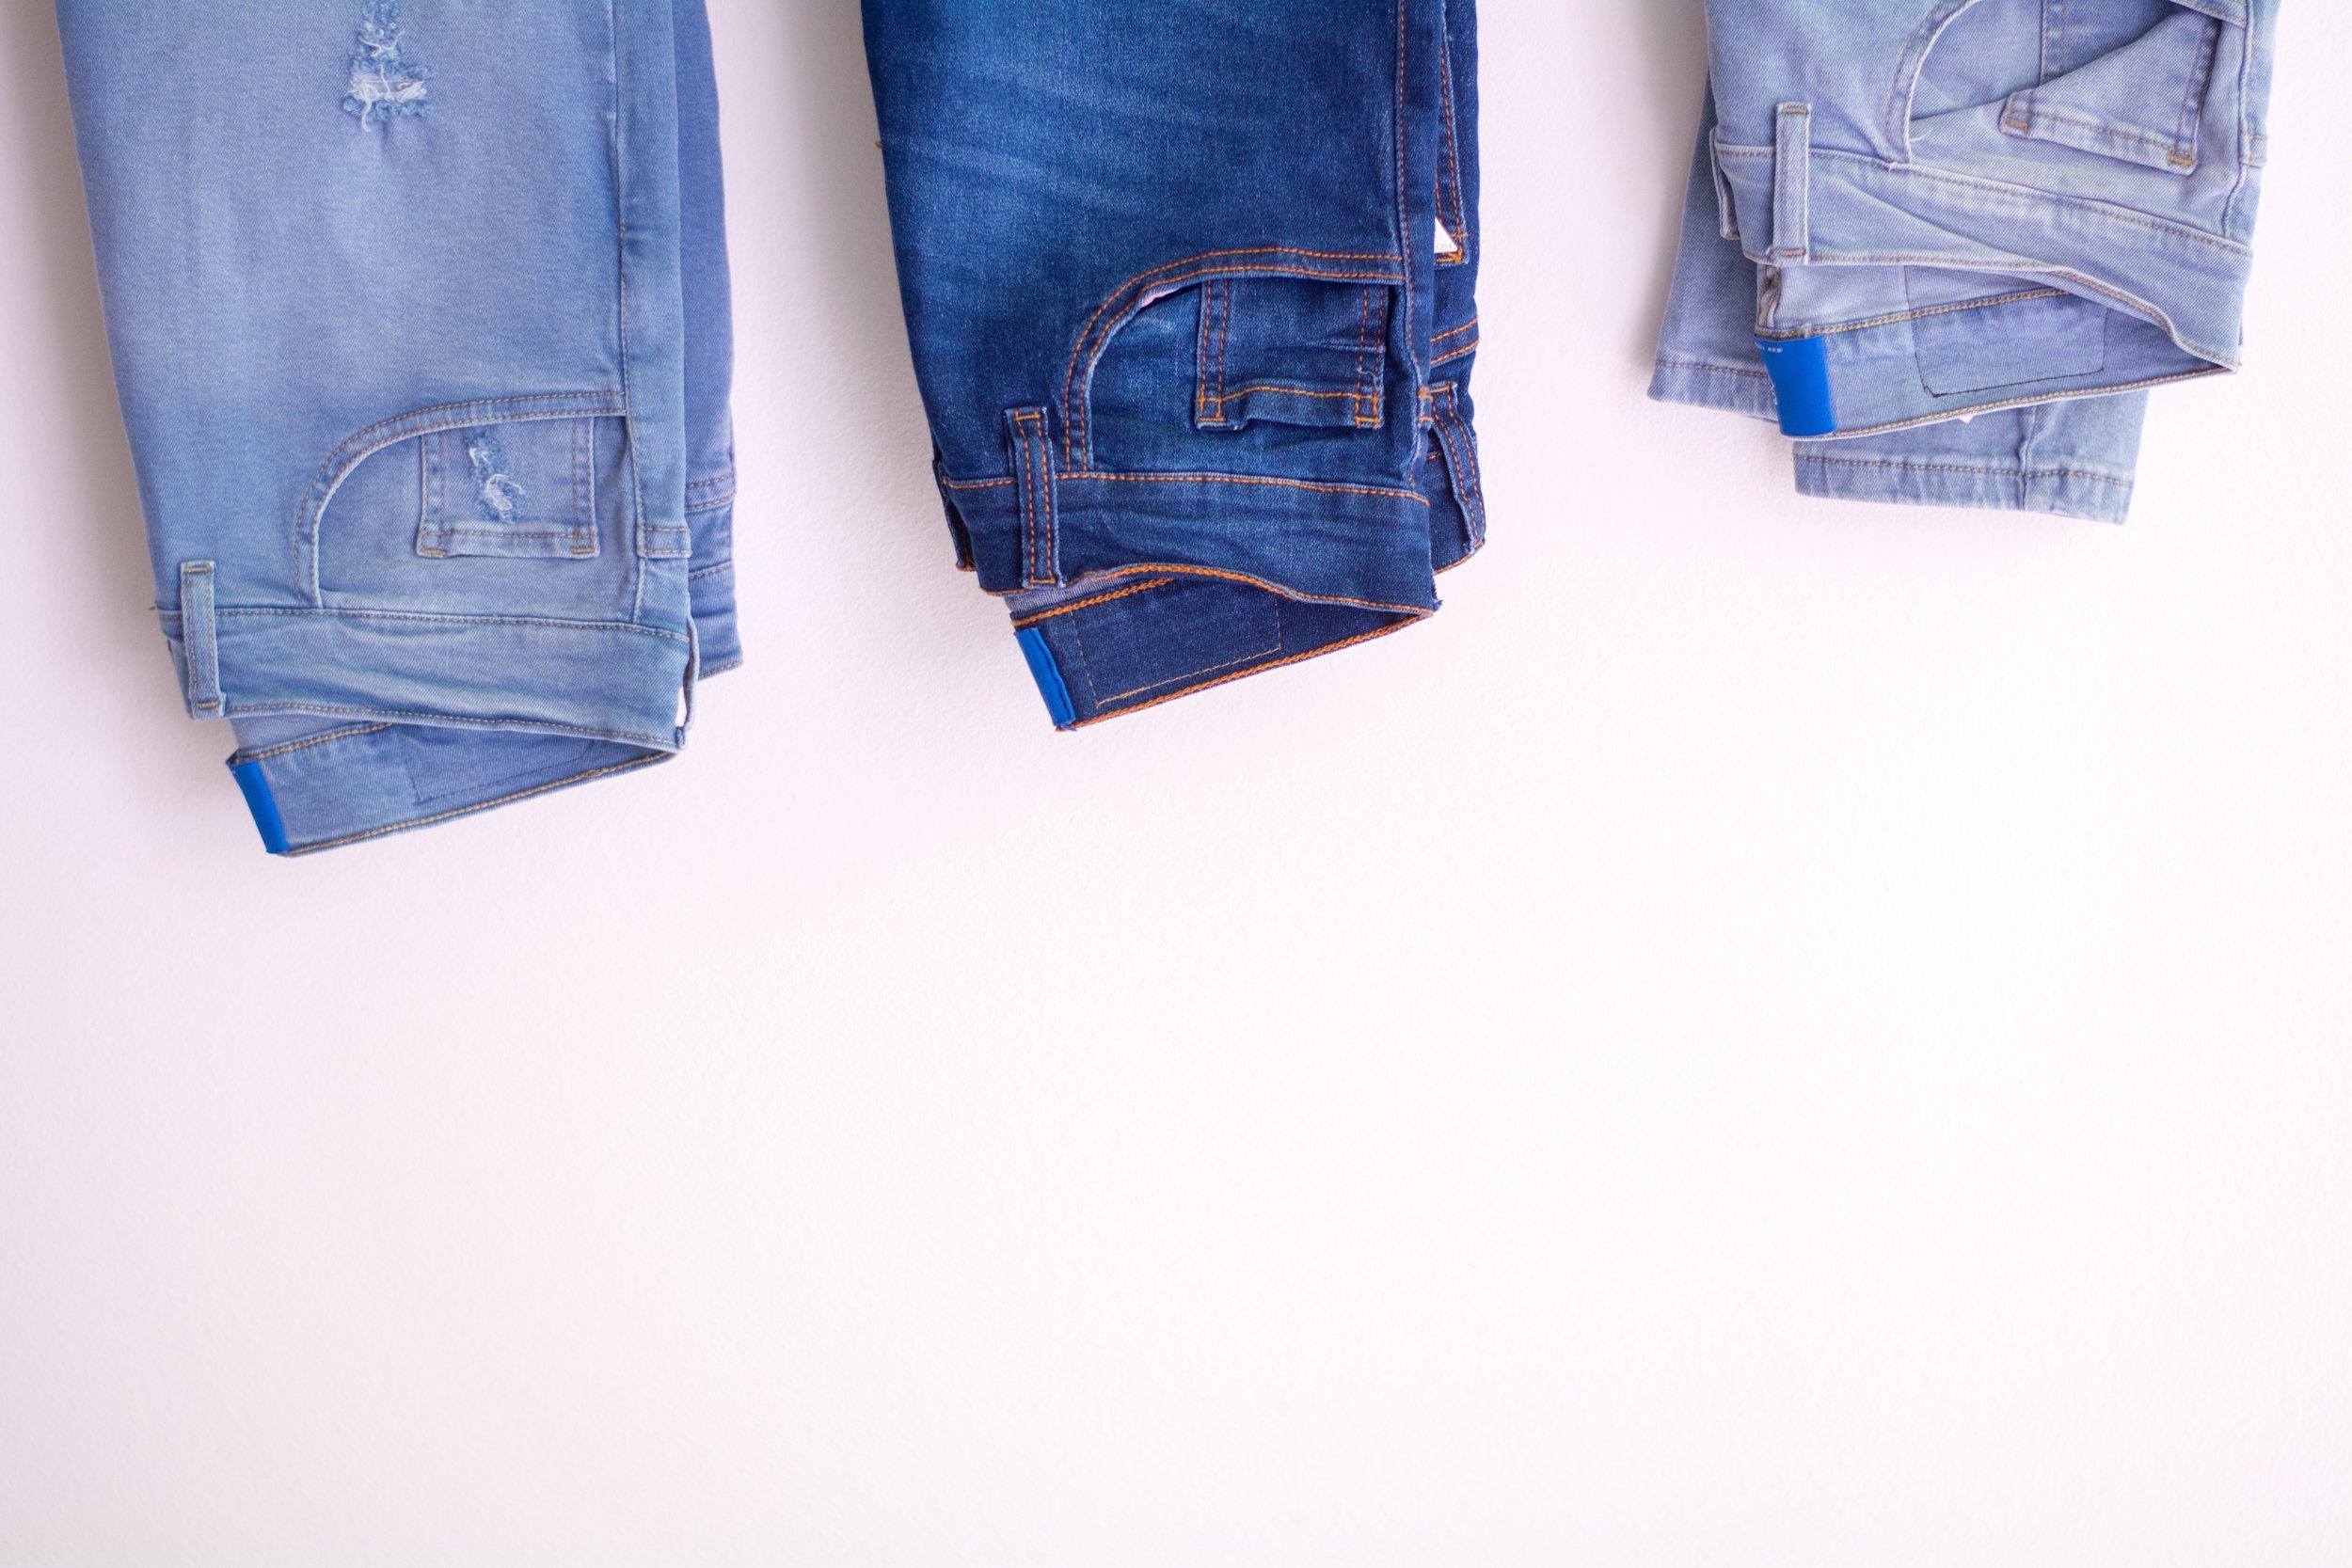 apparel-blue-jeans-casual-1082529.jpg